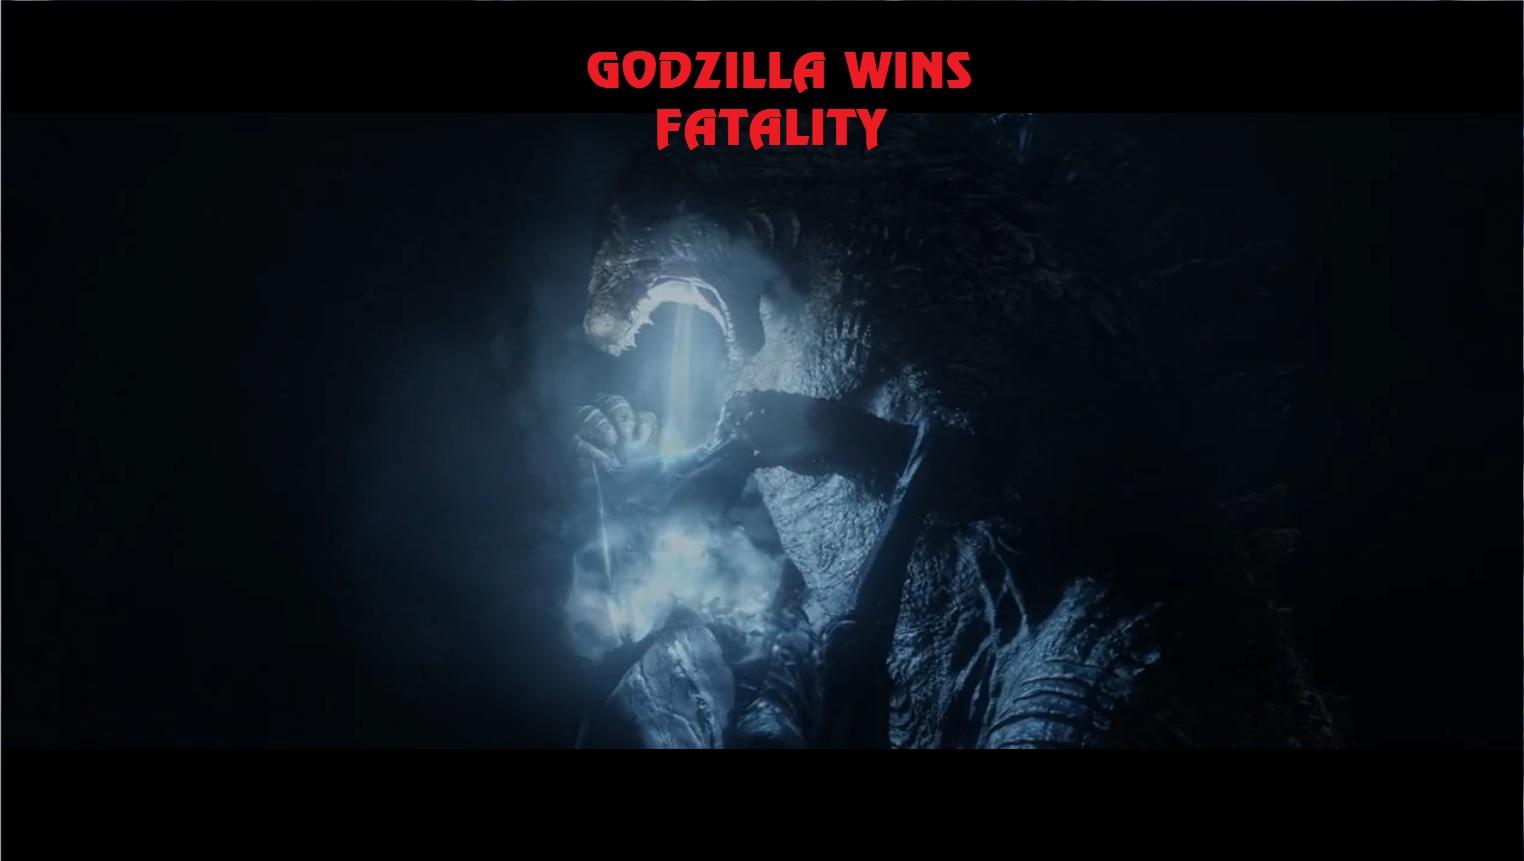 Godzilla Wins - Fatality.jpg